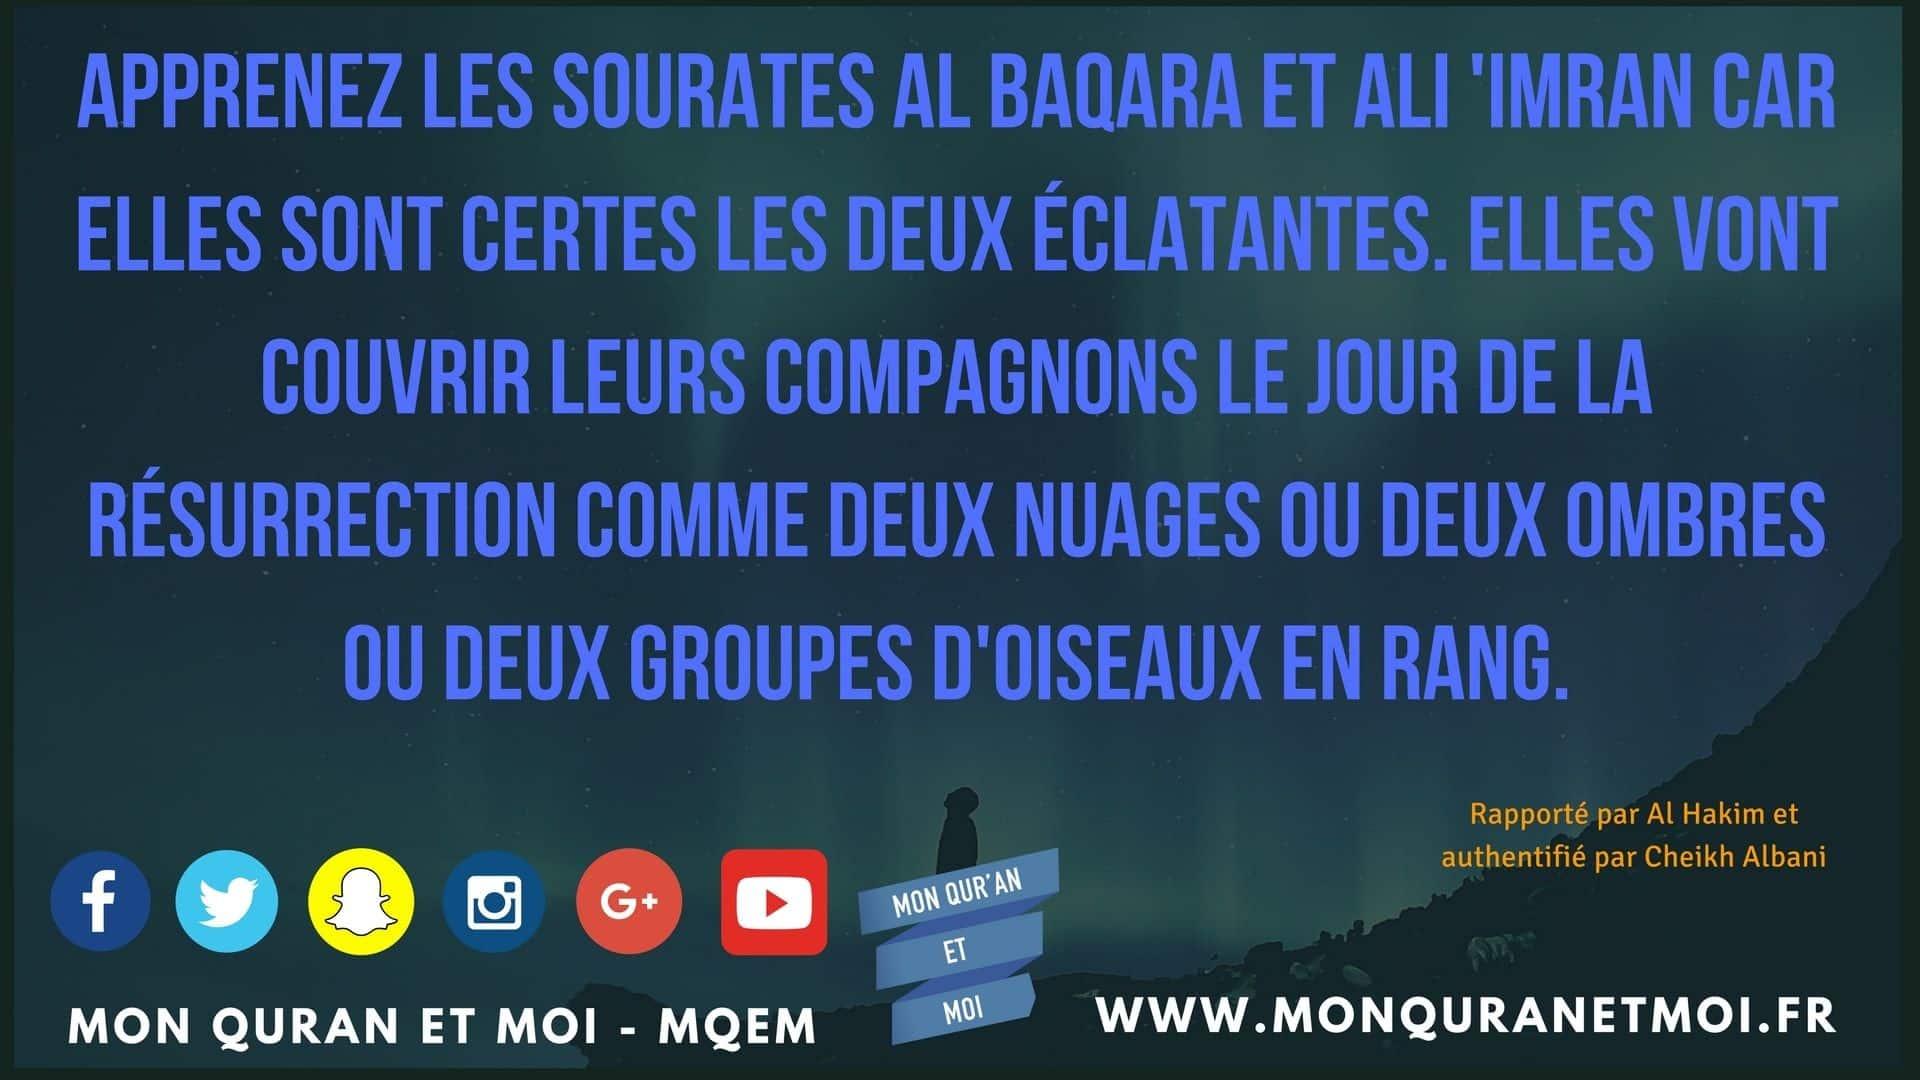 Sourate-al-baqara-2-e1509459464283.jpg